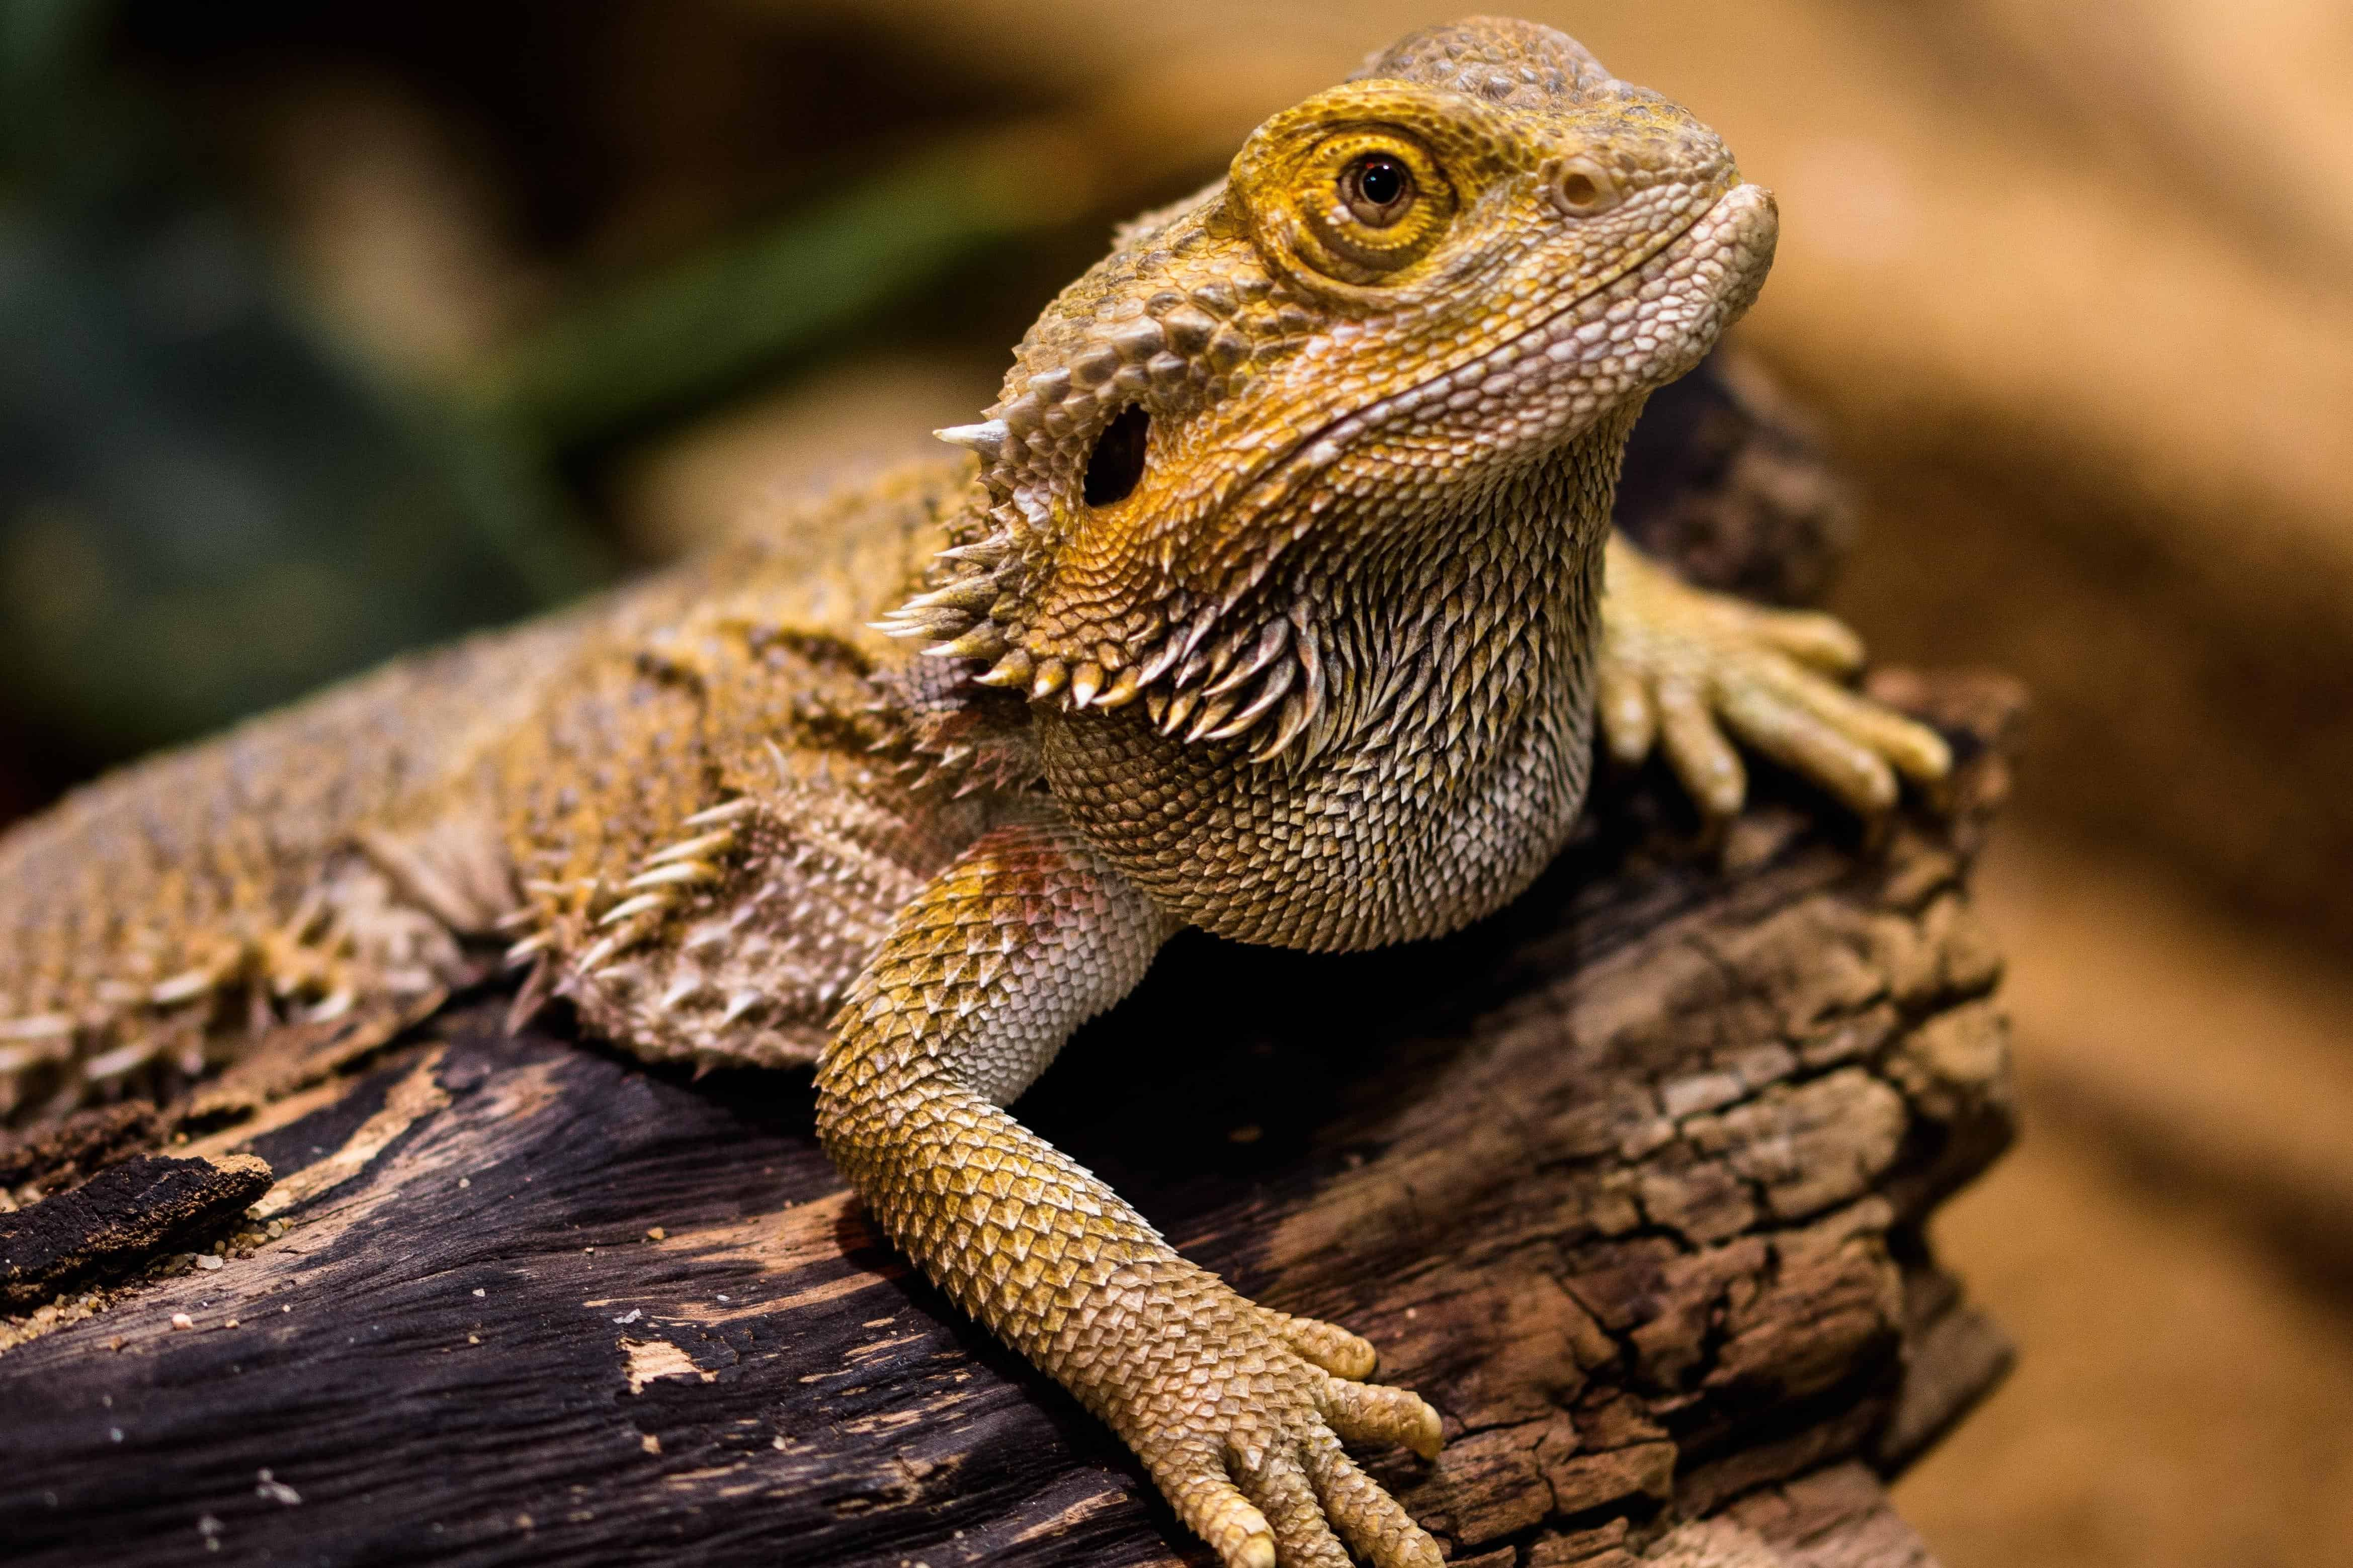 Free Picture Wildlife Wild Reptile Nature Lizard Animal Iguana Dragon